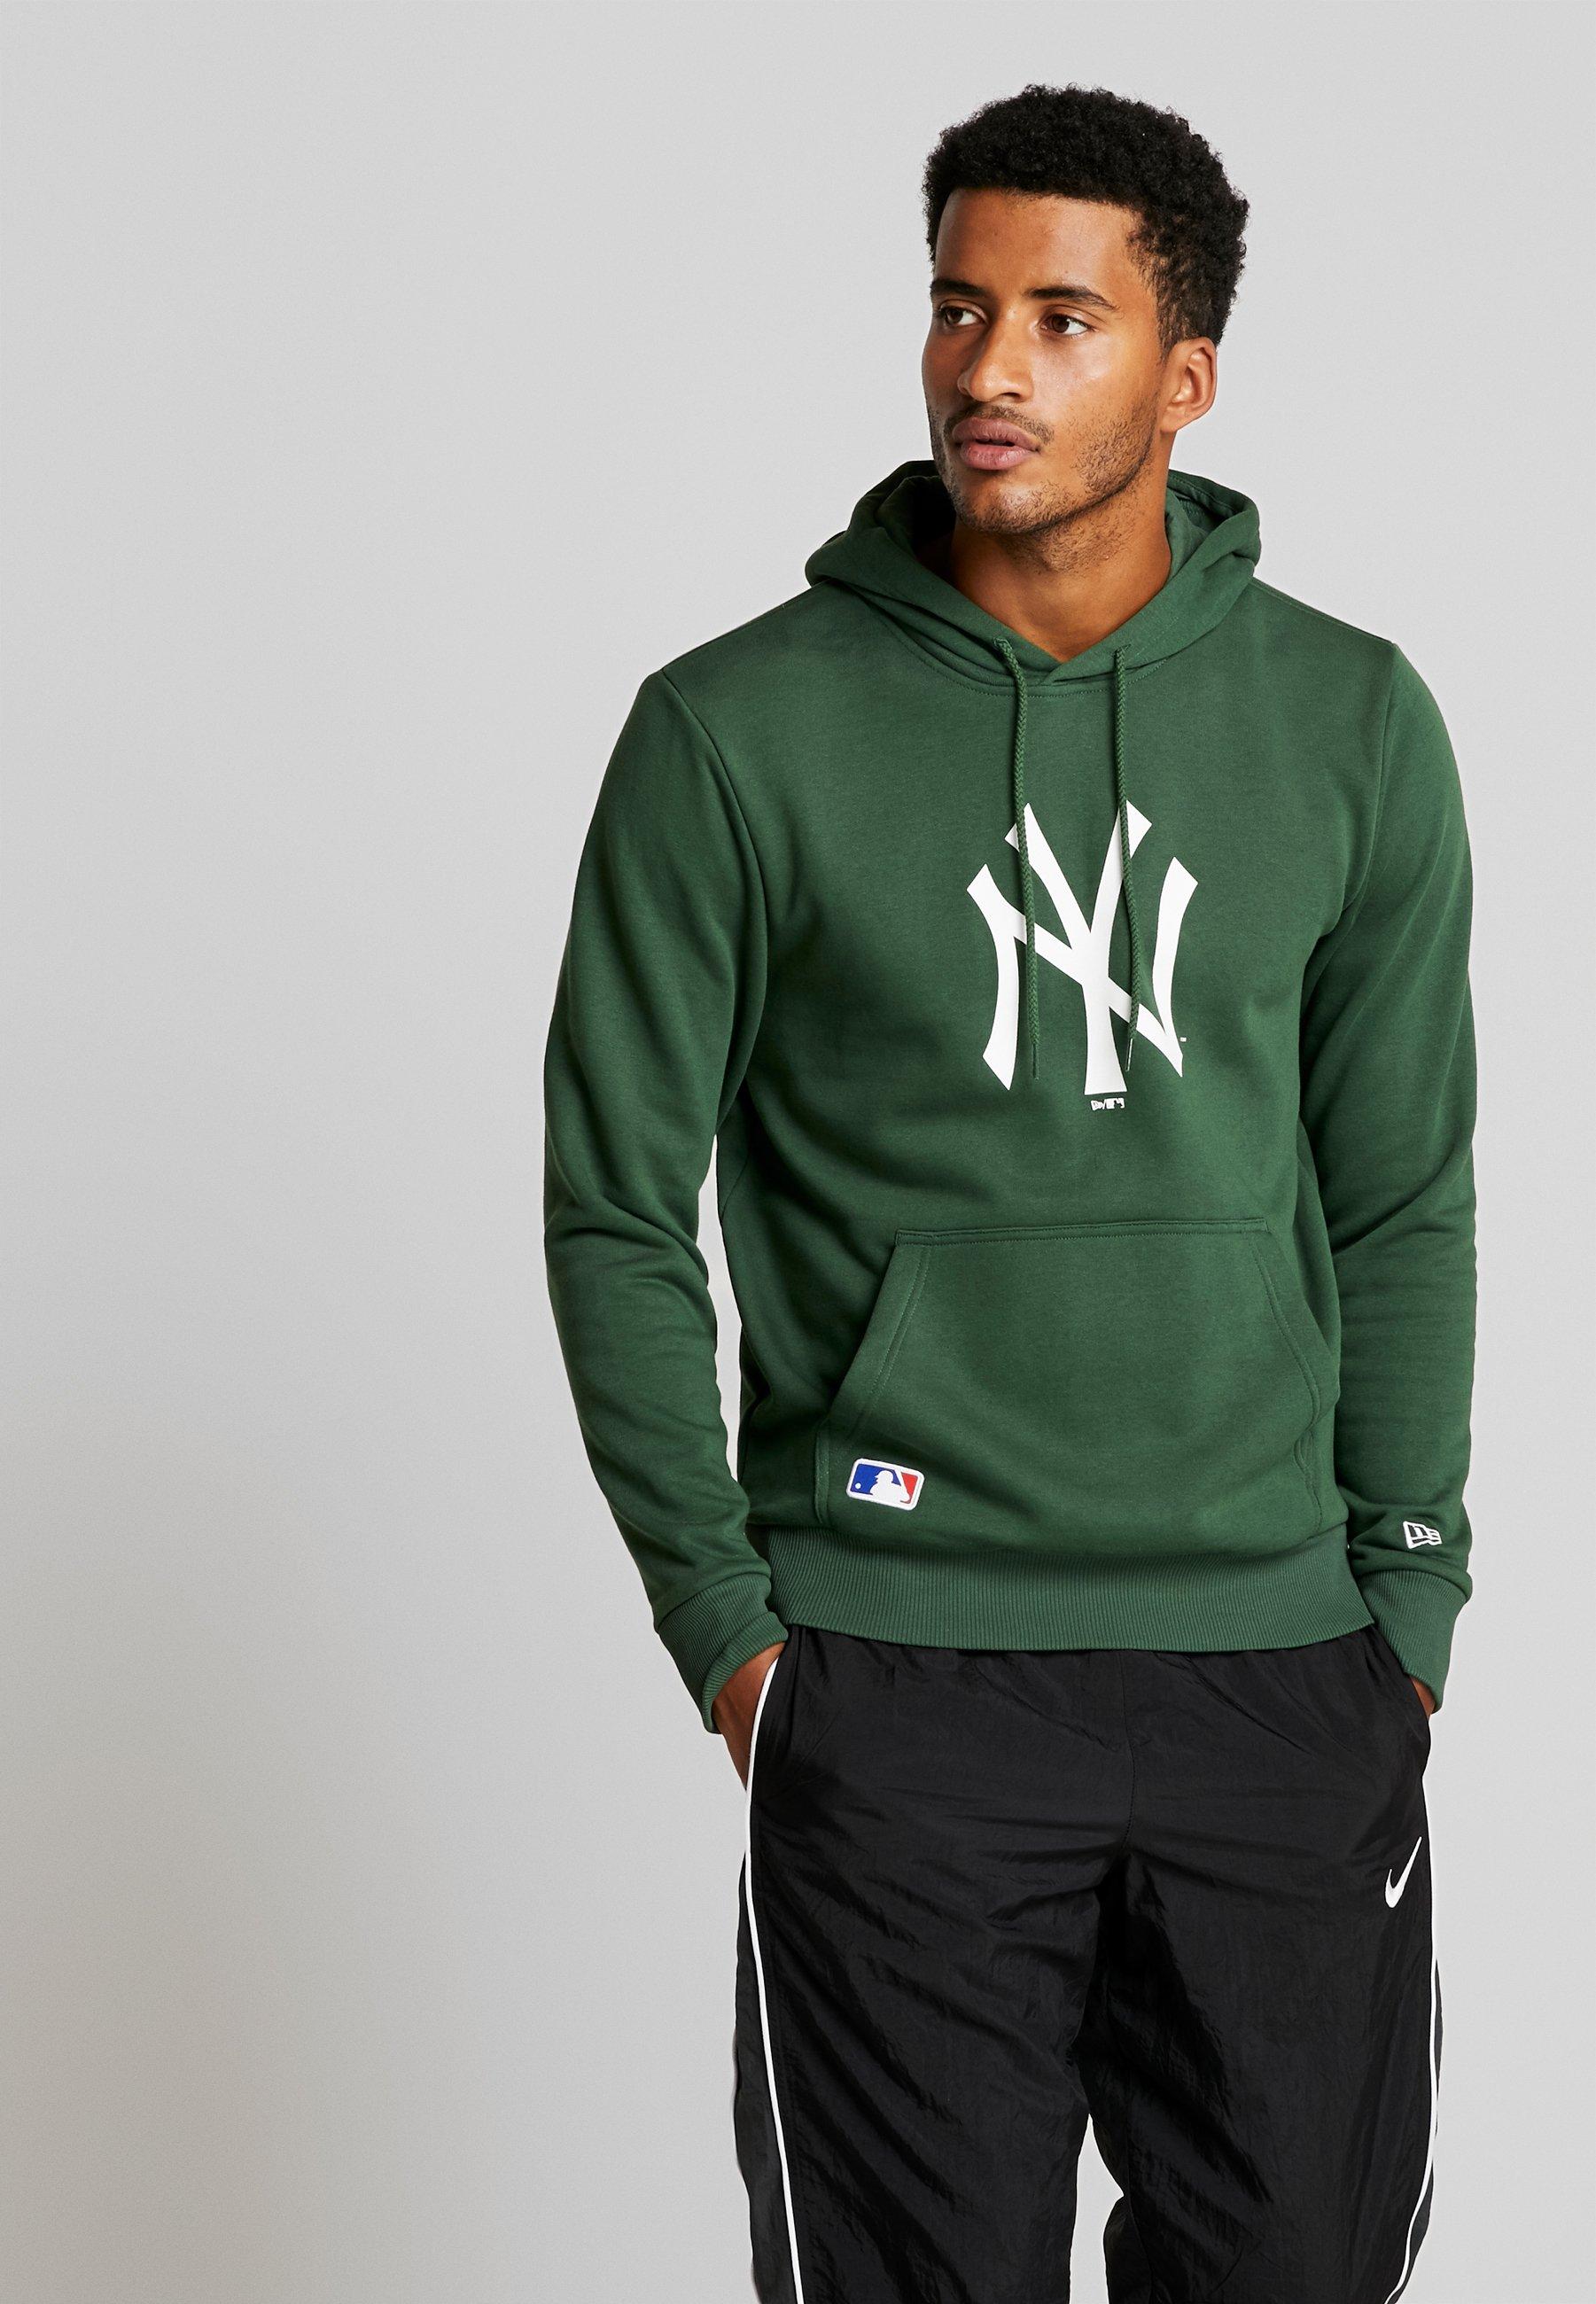 New Era Supporter Yankees Team De York Logo HoodyArticle Mlb Green Seasonal dQshxBtCr